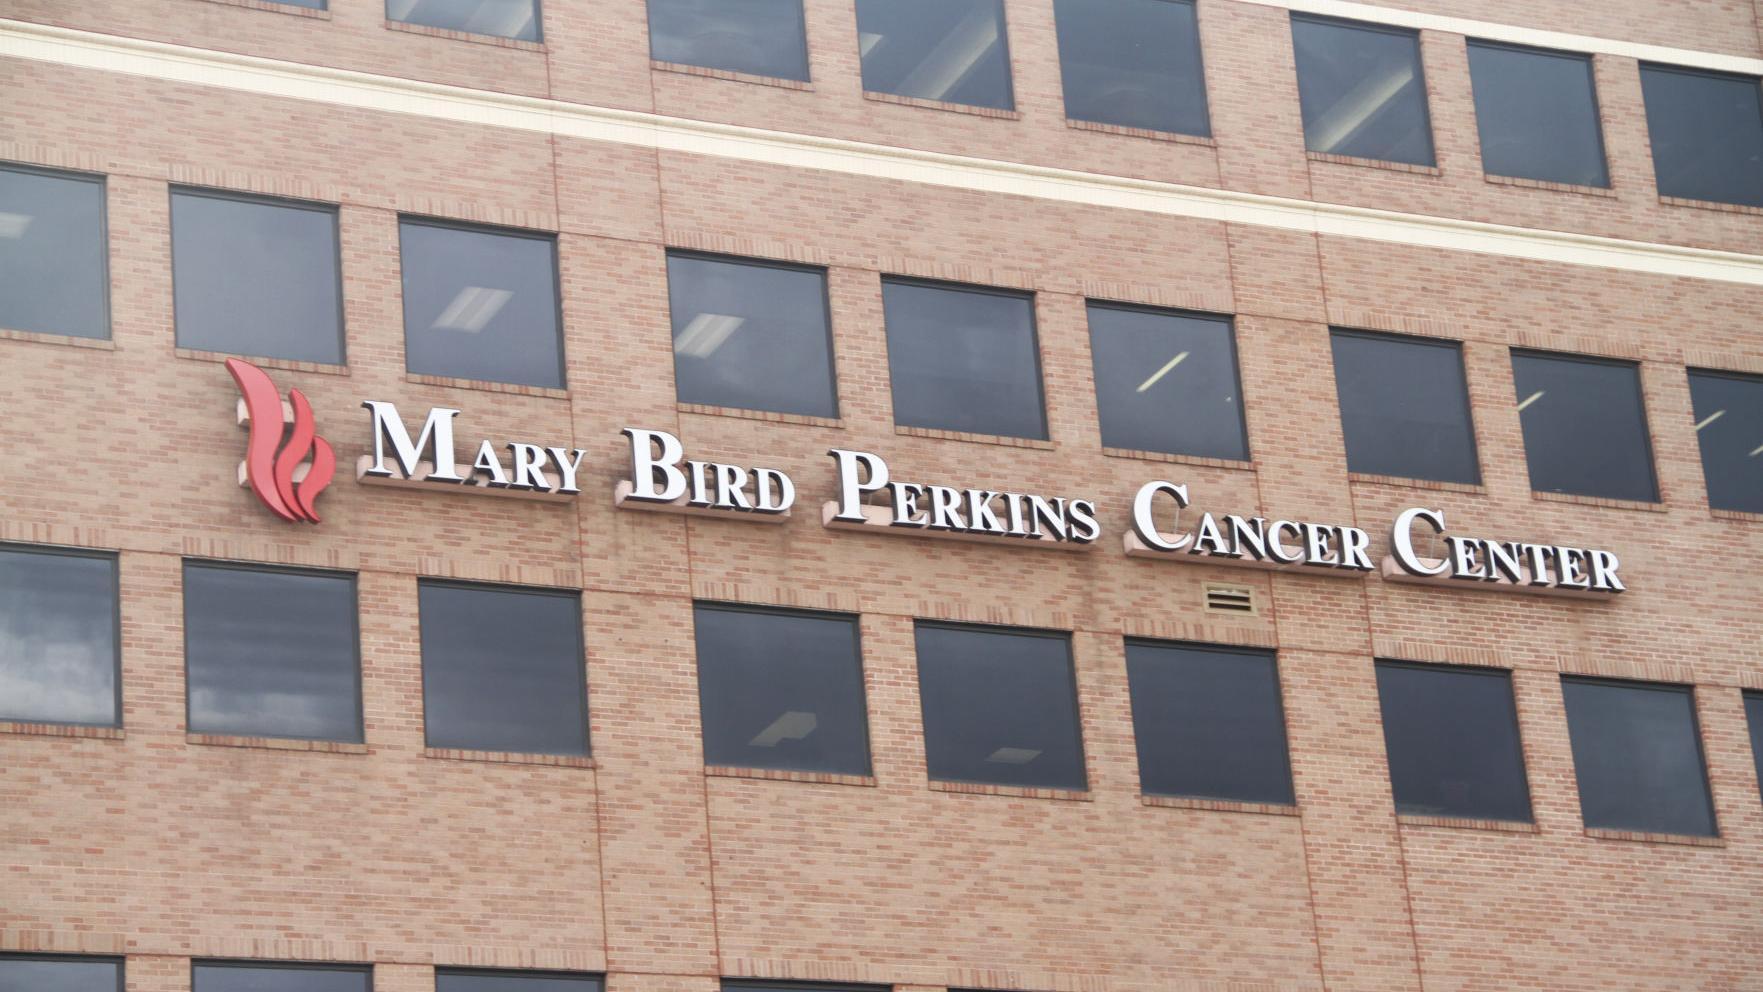 with Mary Bird Perkins Cancer Center